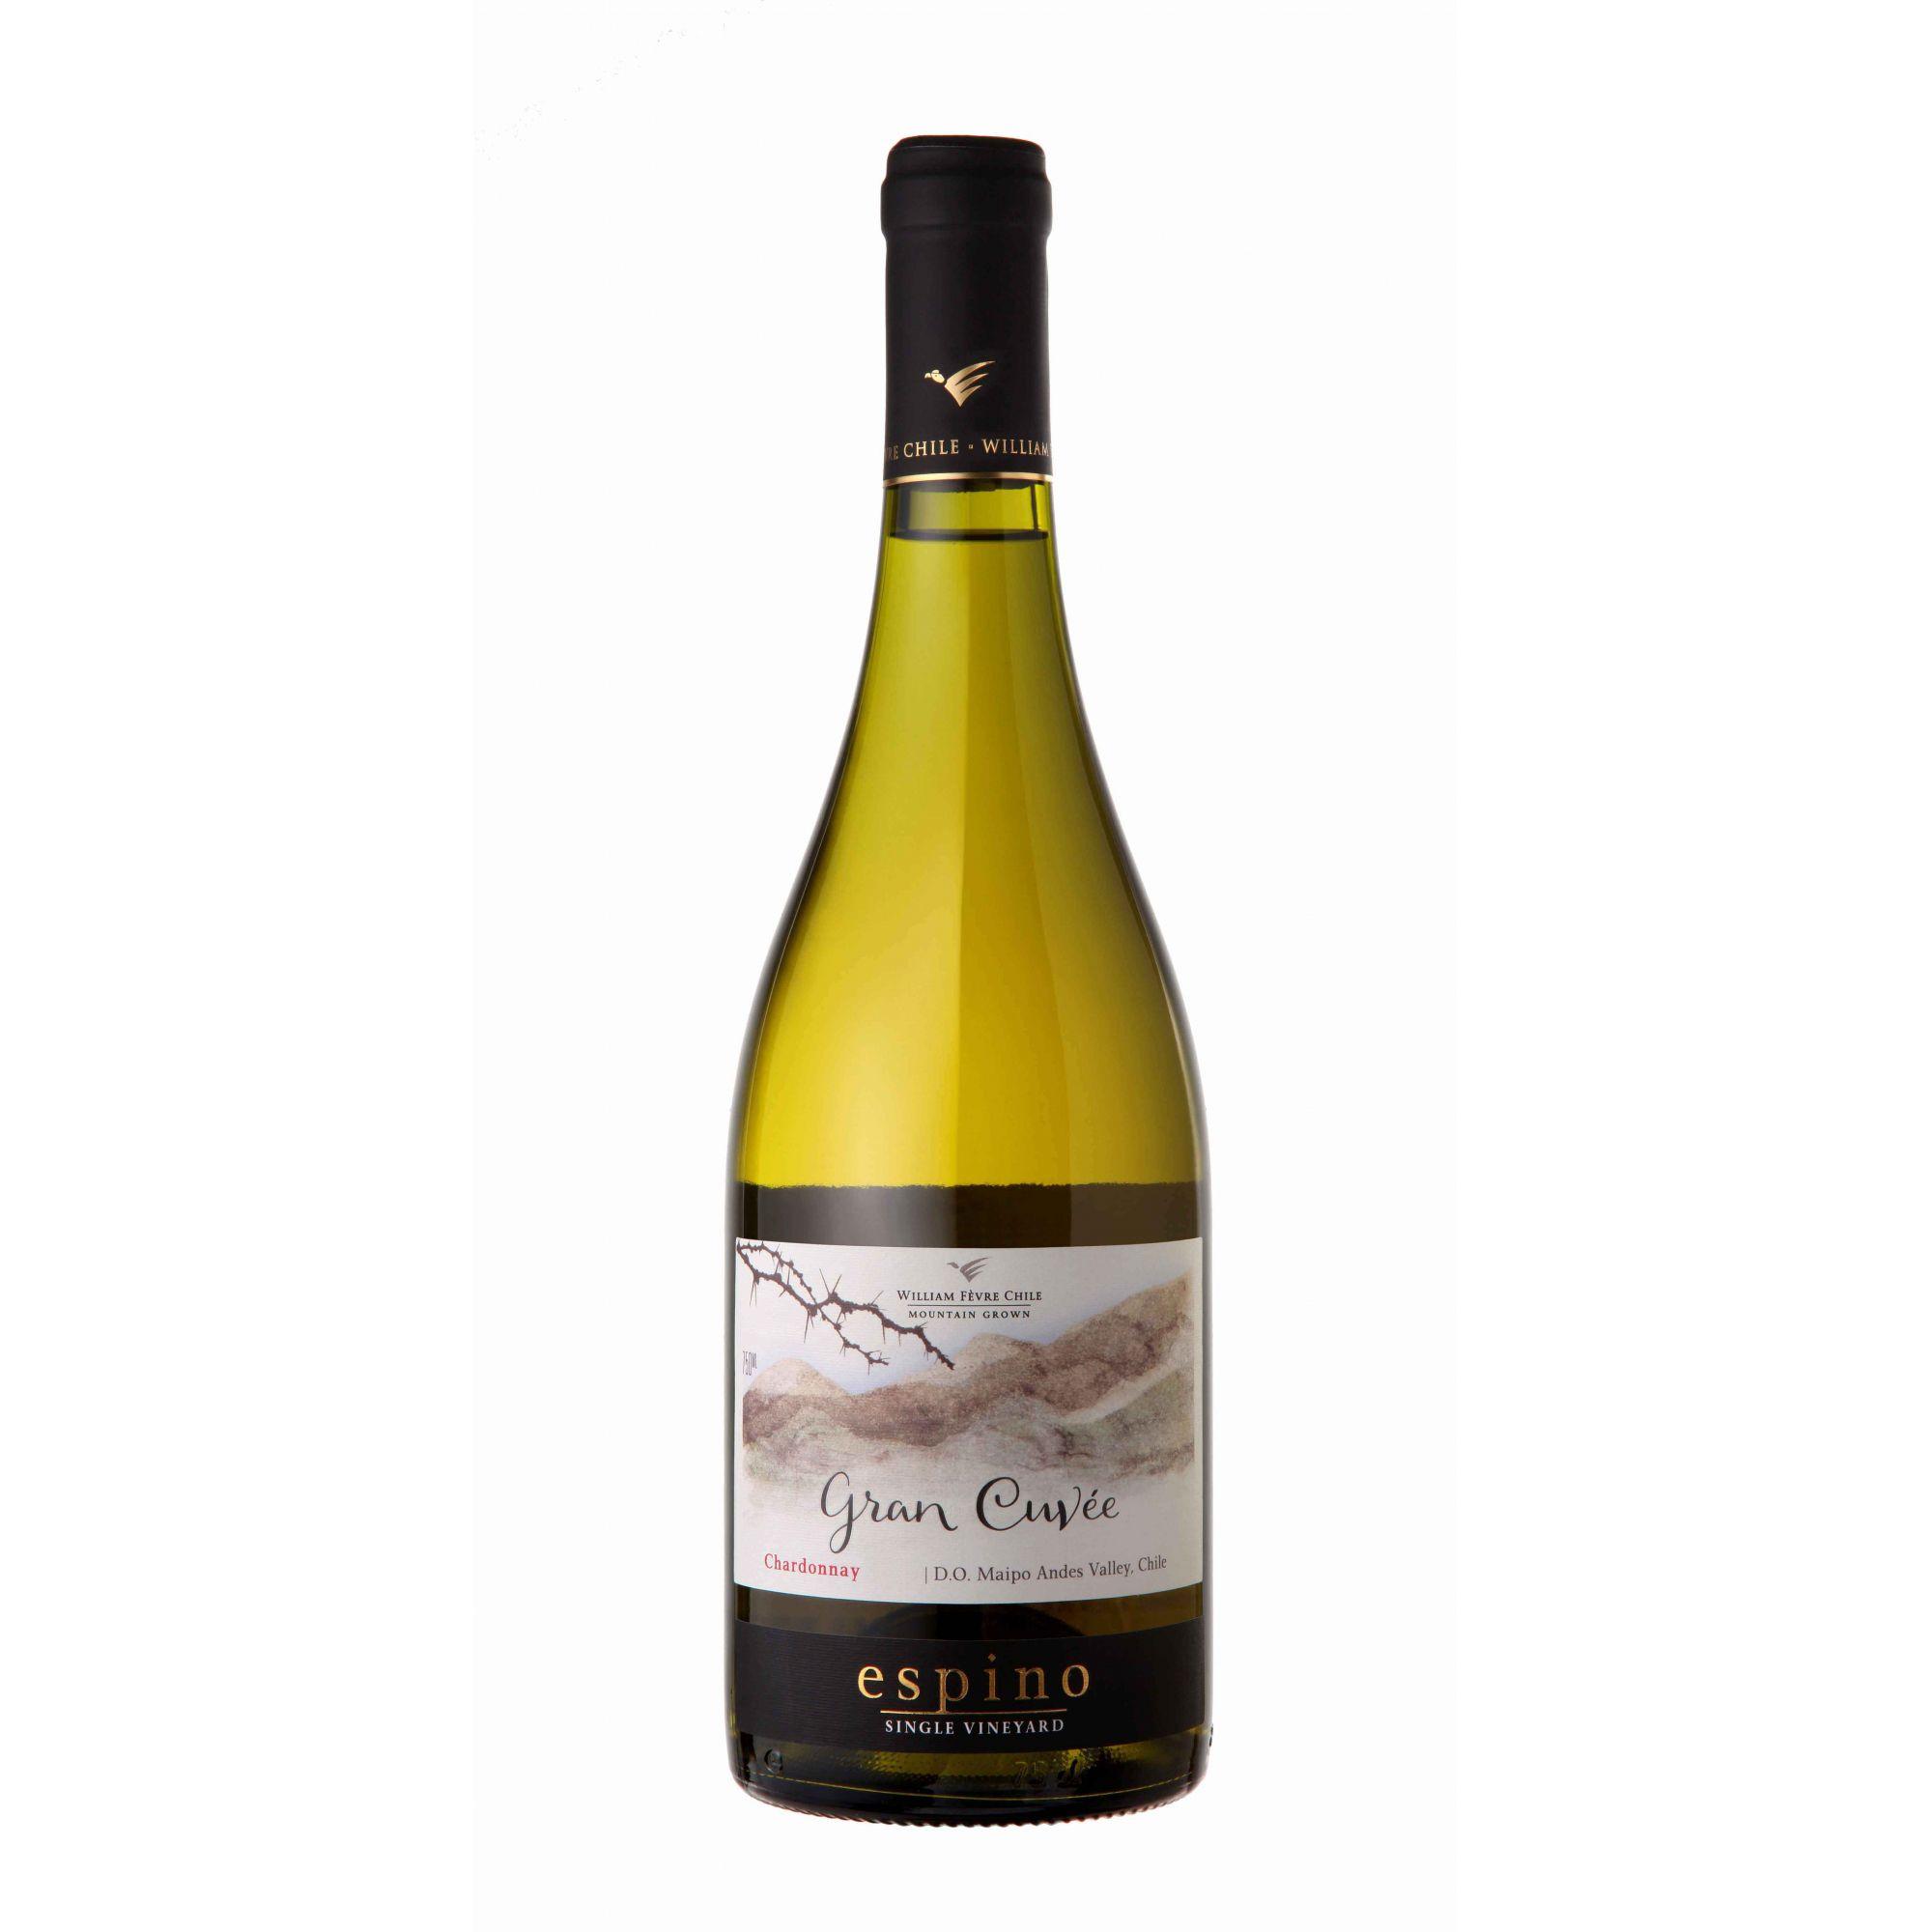 Vinho Espino Gran Cuvee Chardonnay 2018